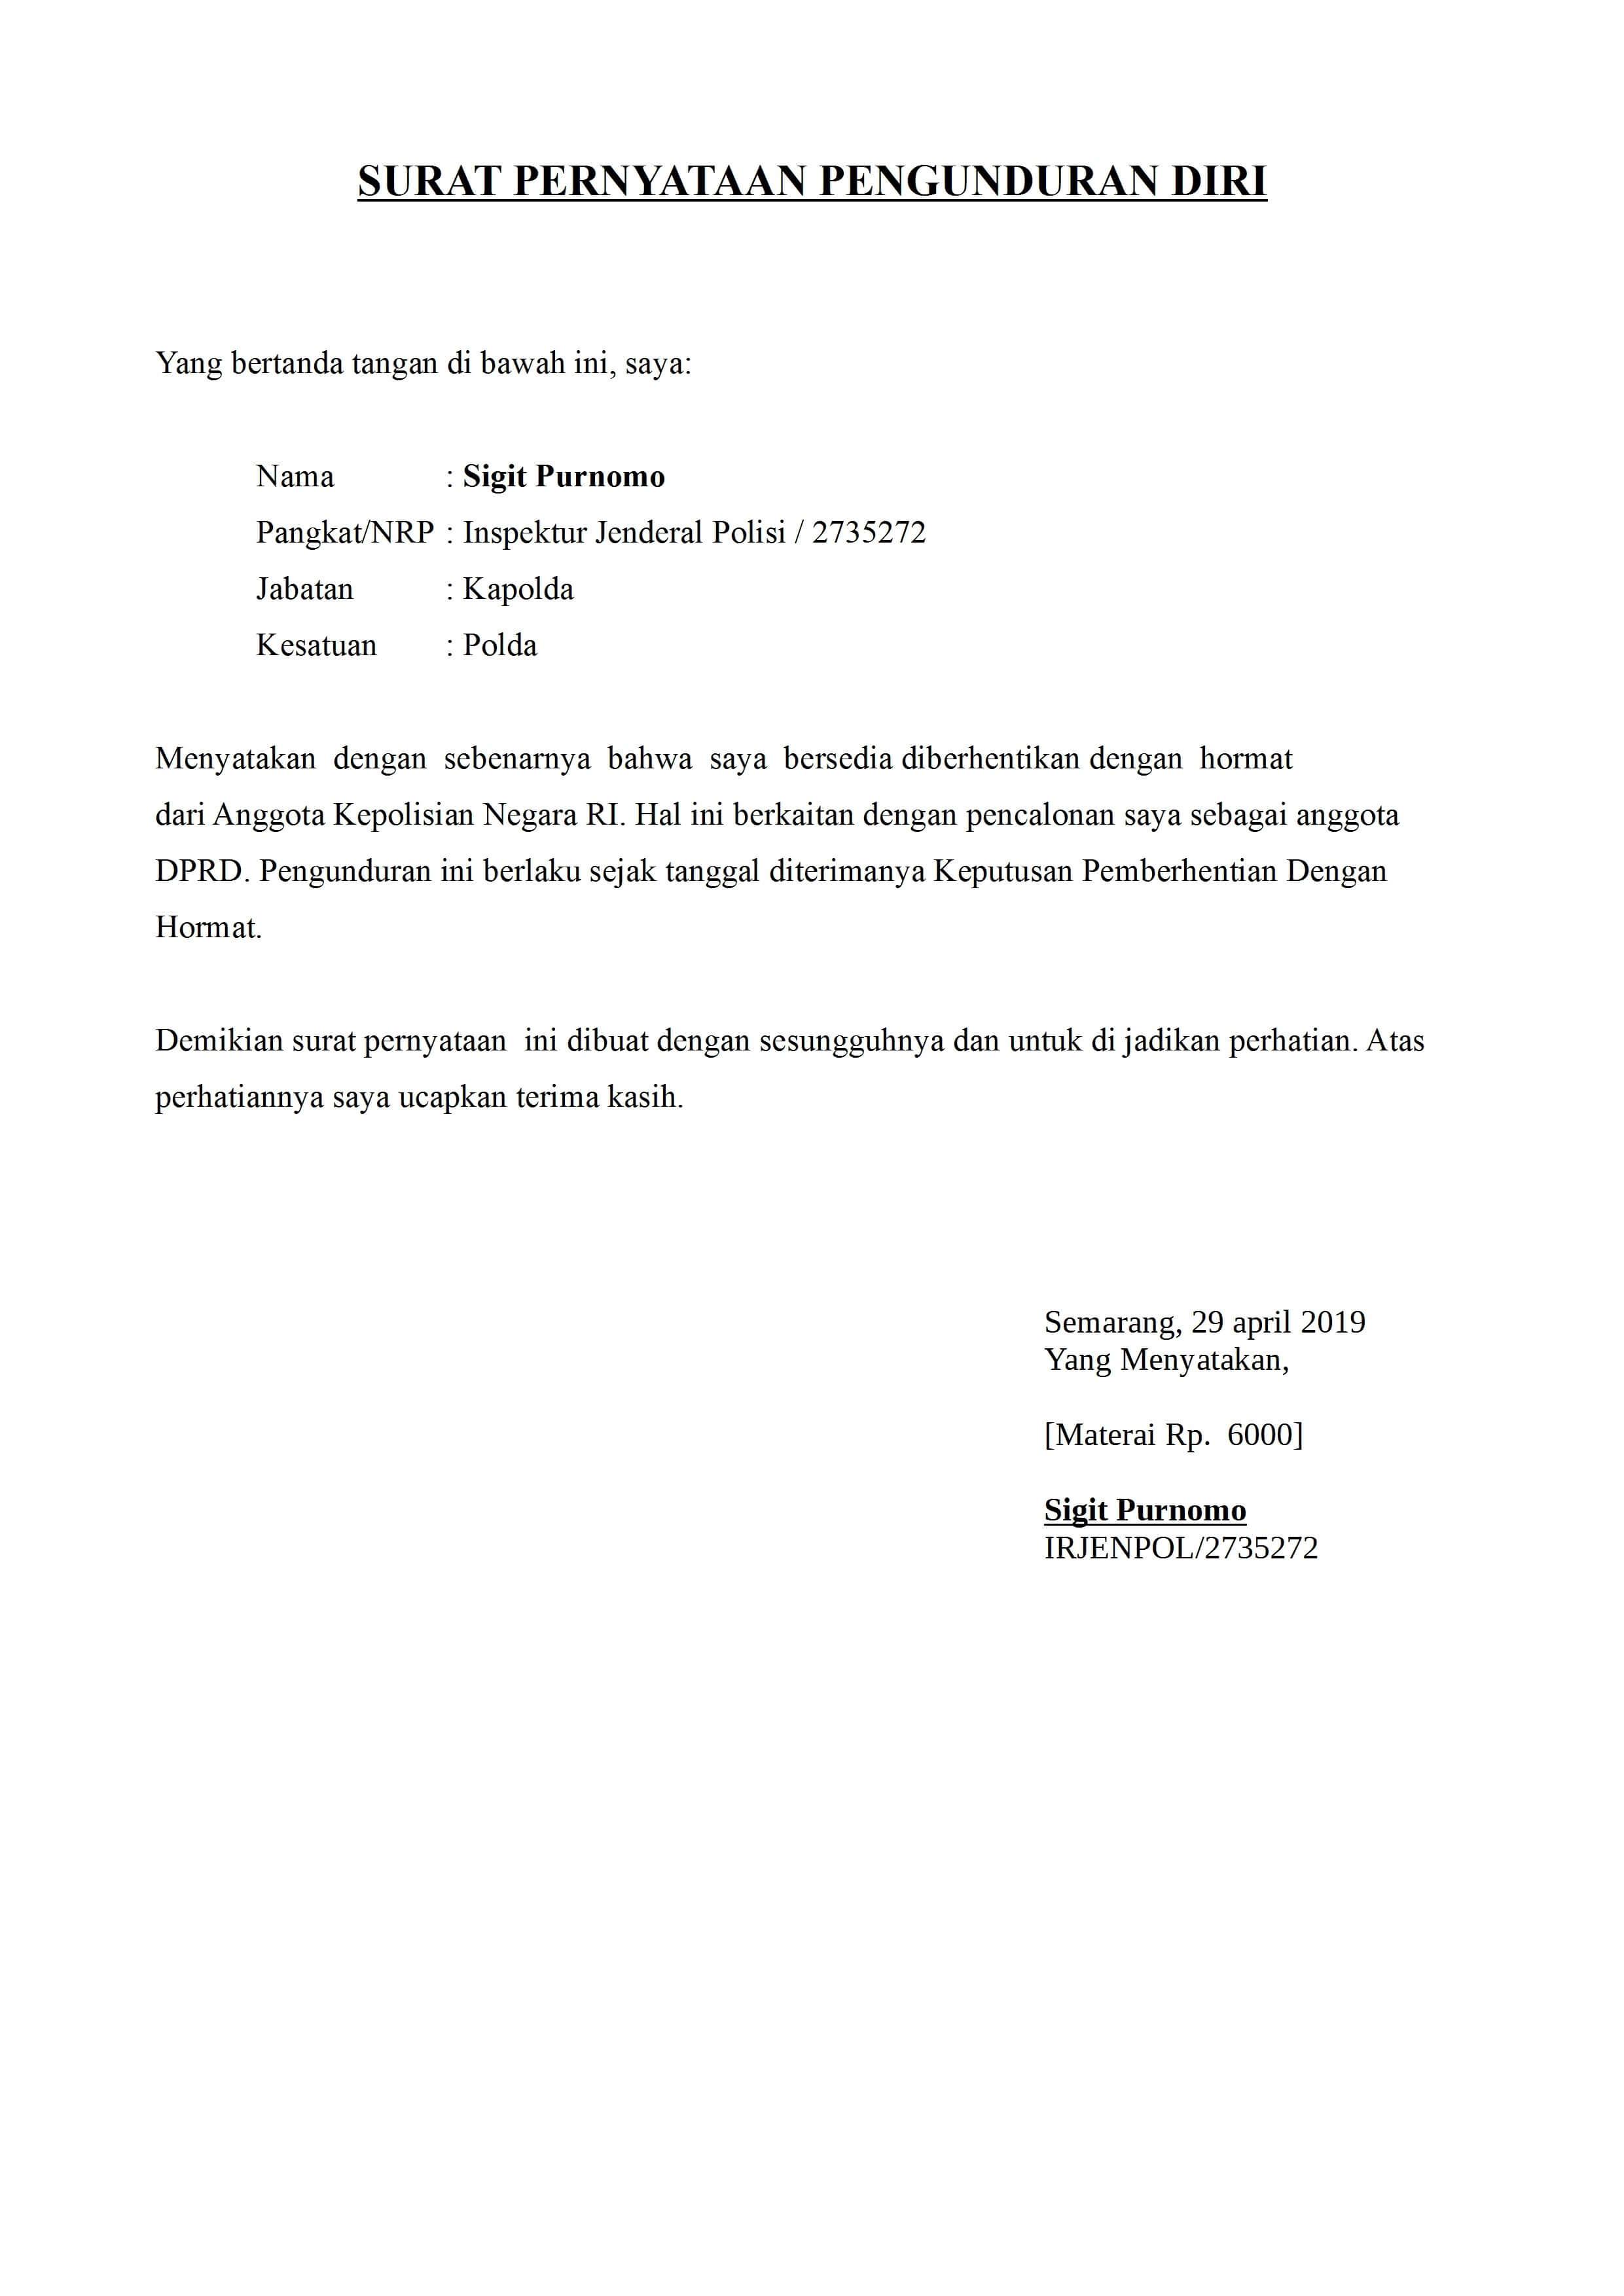 35++ Contoh surat pengunduran diri hmi terbaru yang baik dan benar